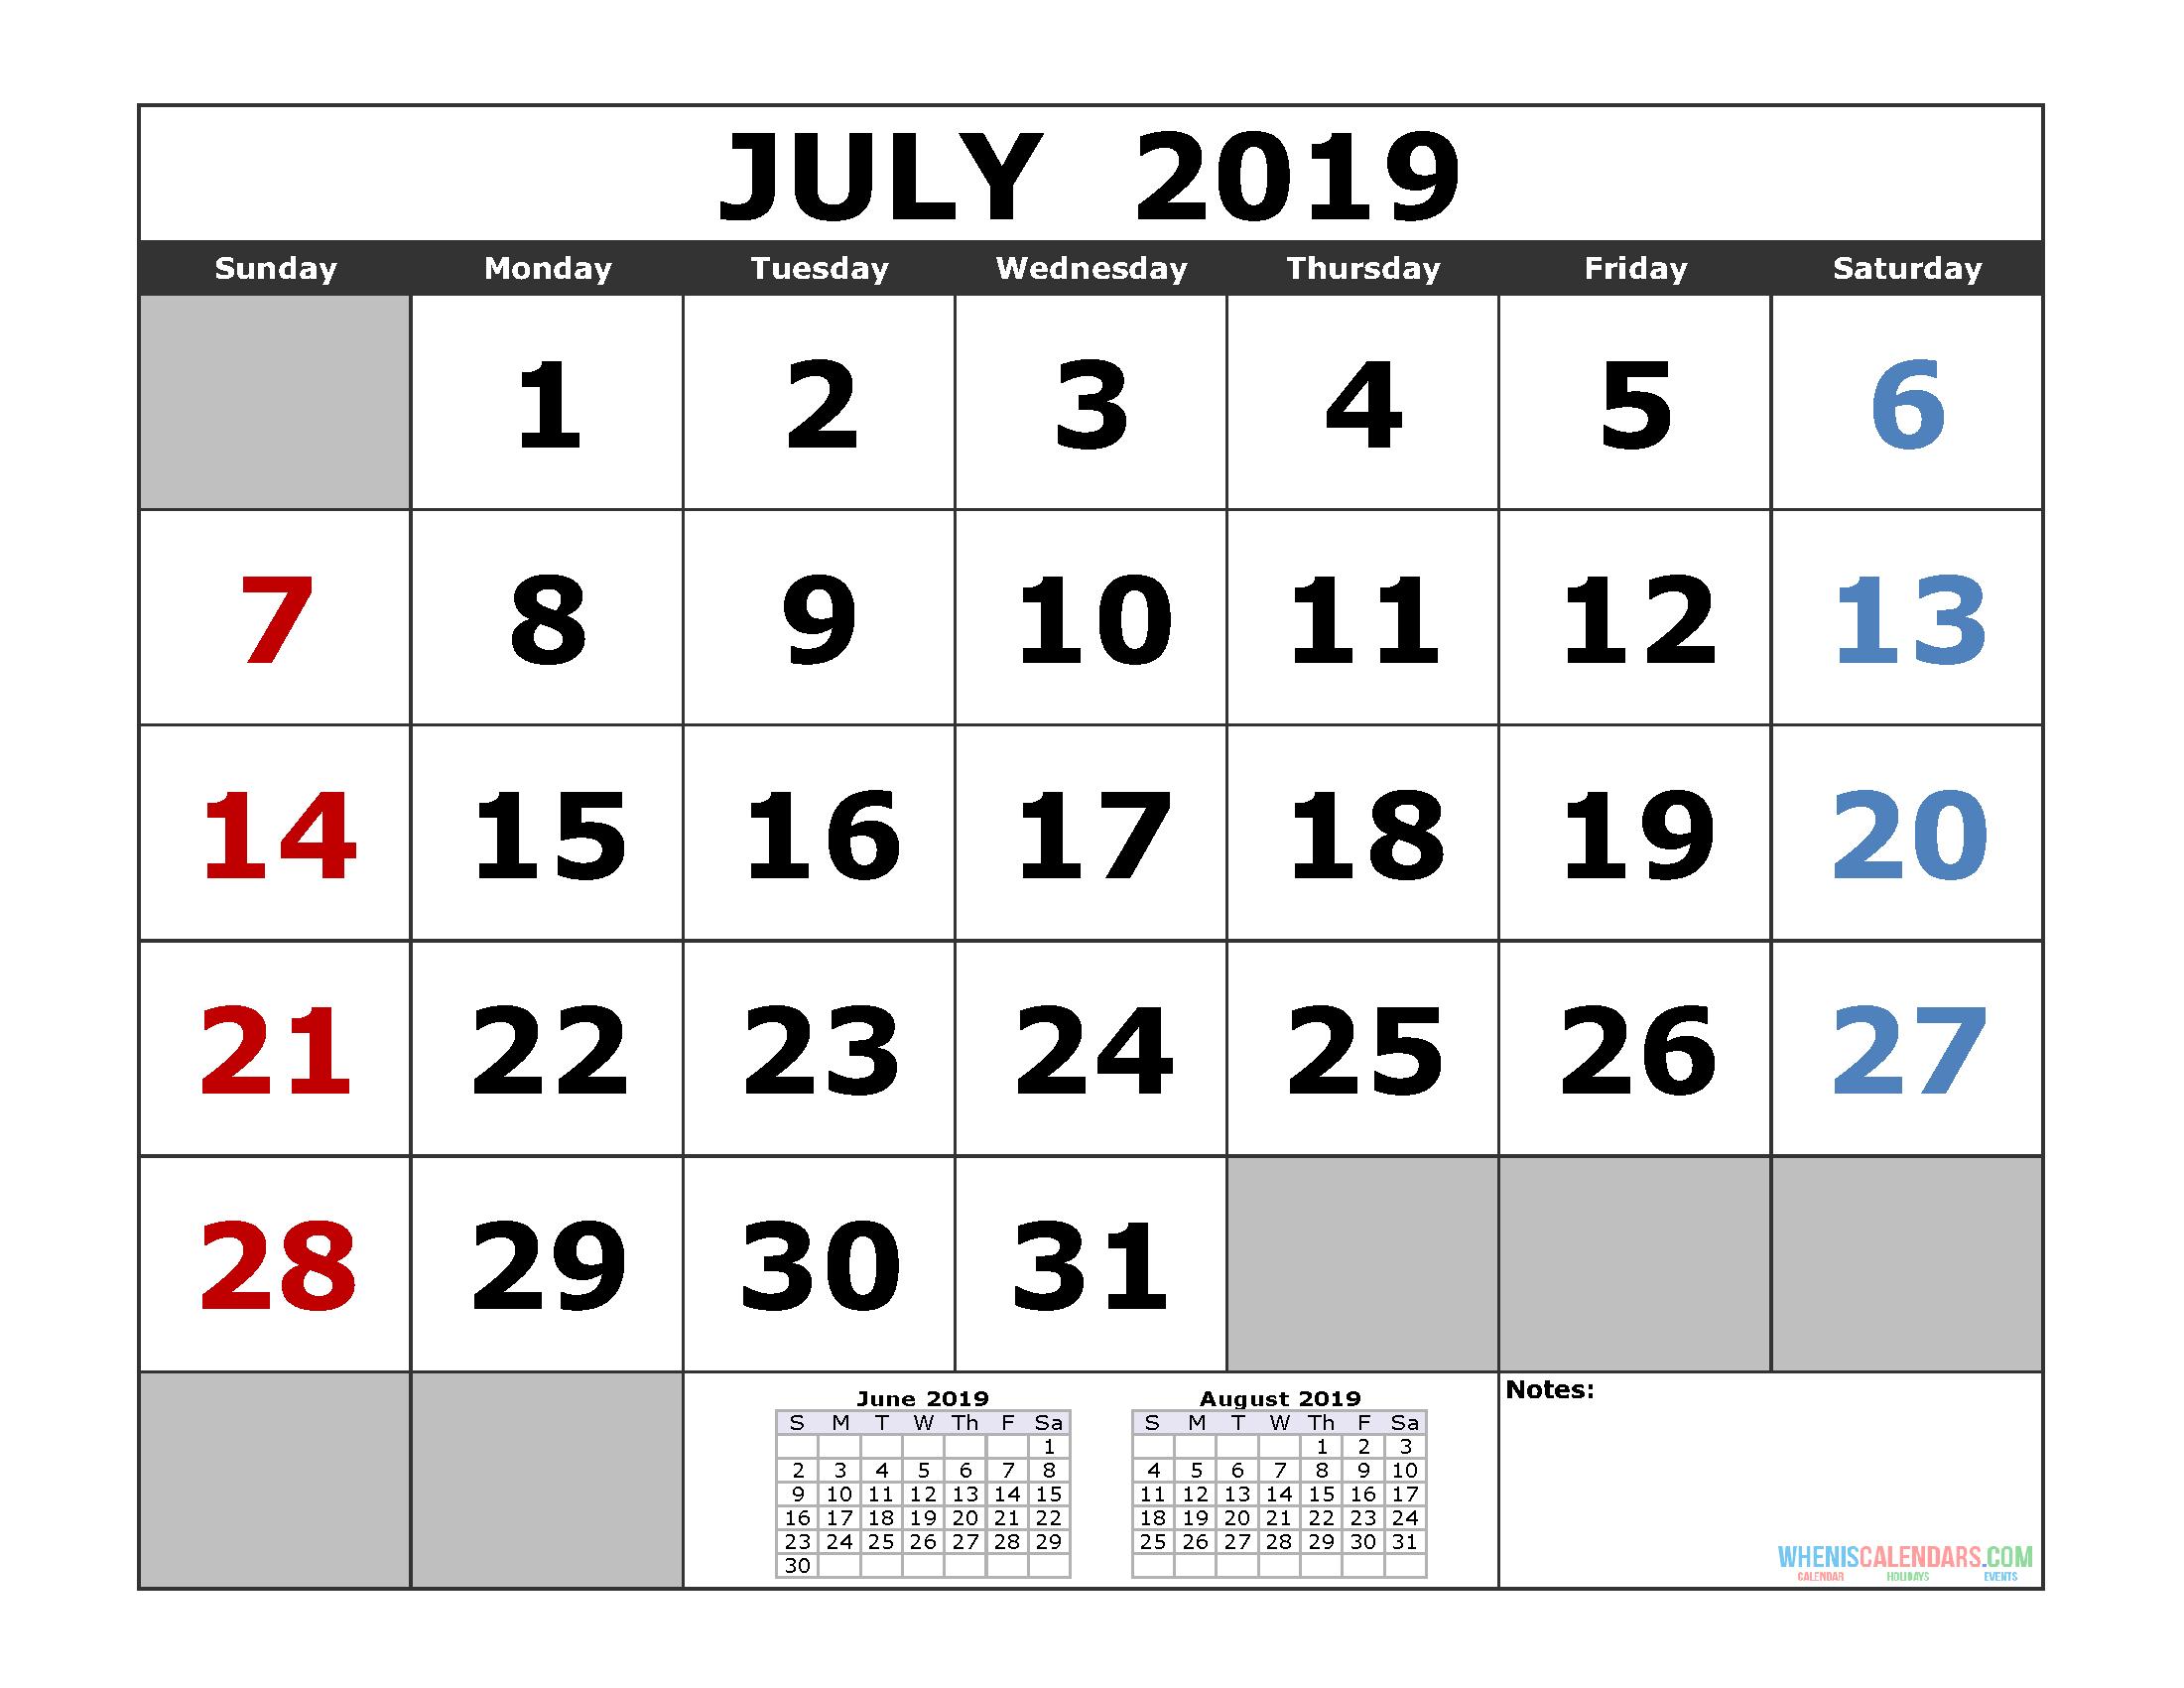 July 2019 Printable Calendar Template (3 Month Calendar)   Free June 7 2019 Calendar